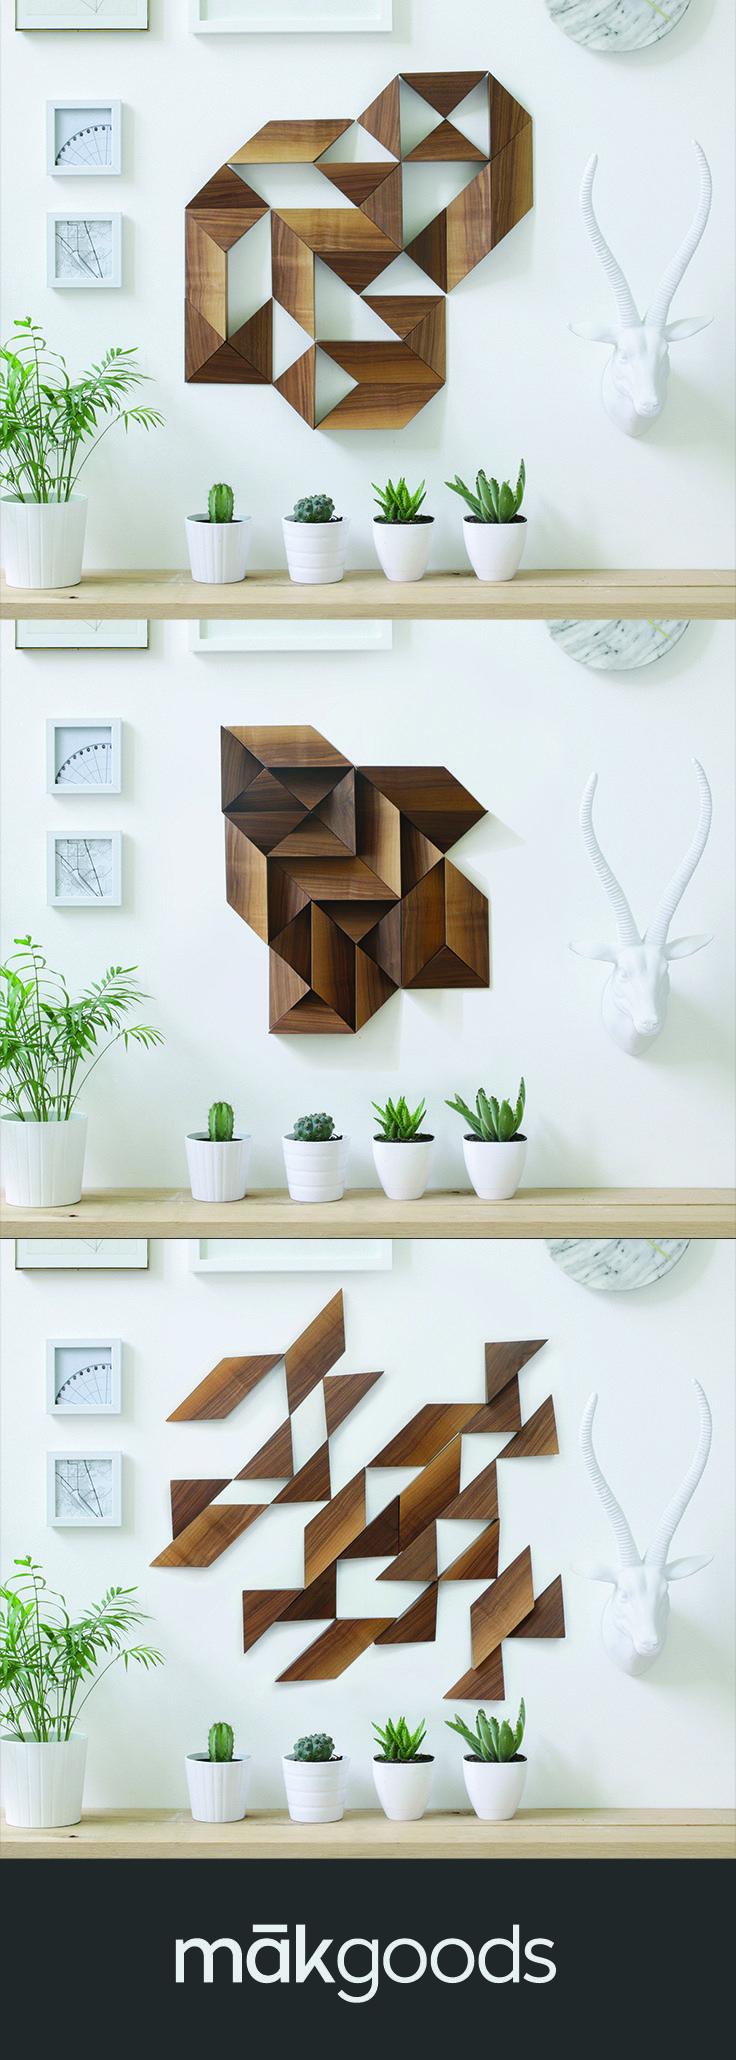 One box infinite possibilities our modular art kits make it easy